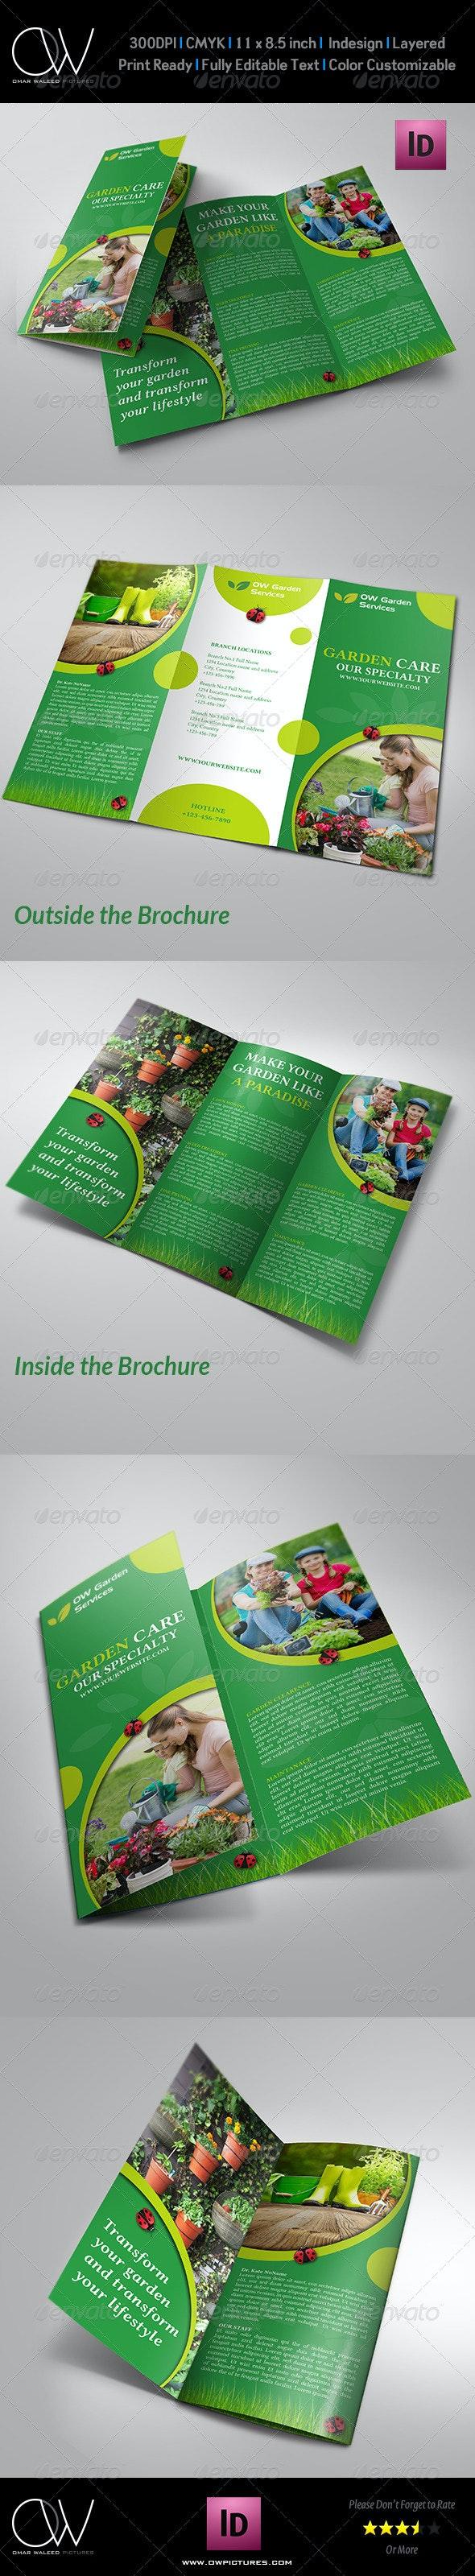 Garden Services Tri-Fold Brochure Template - Corporate Brochures